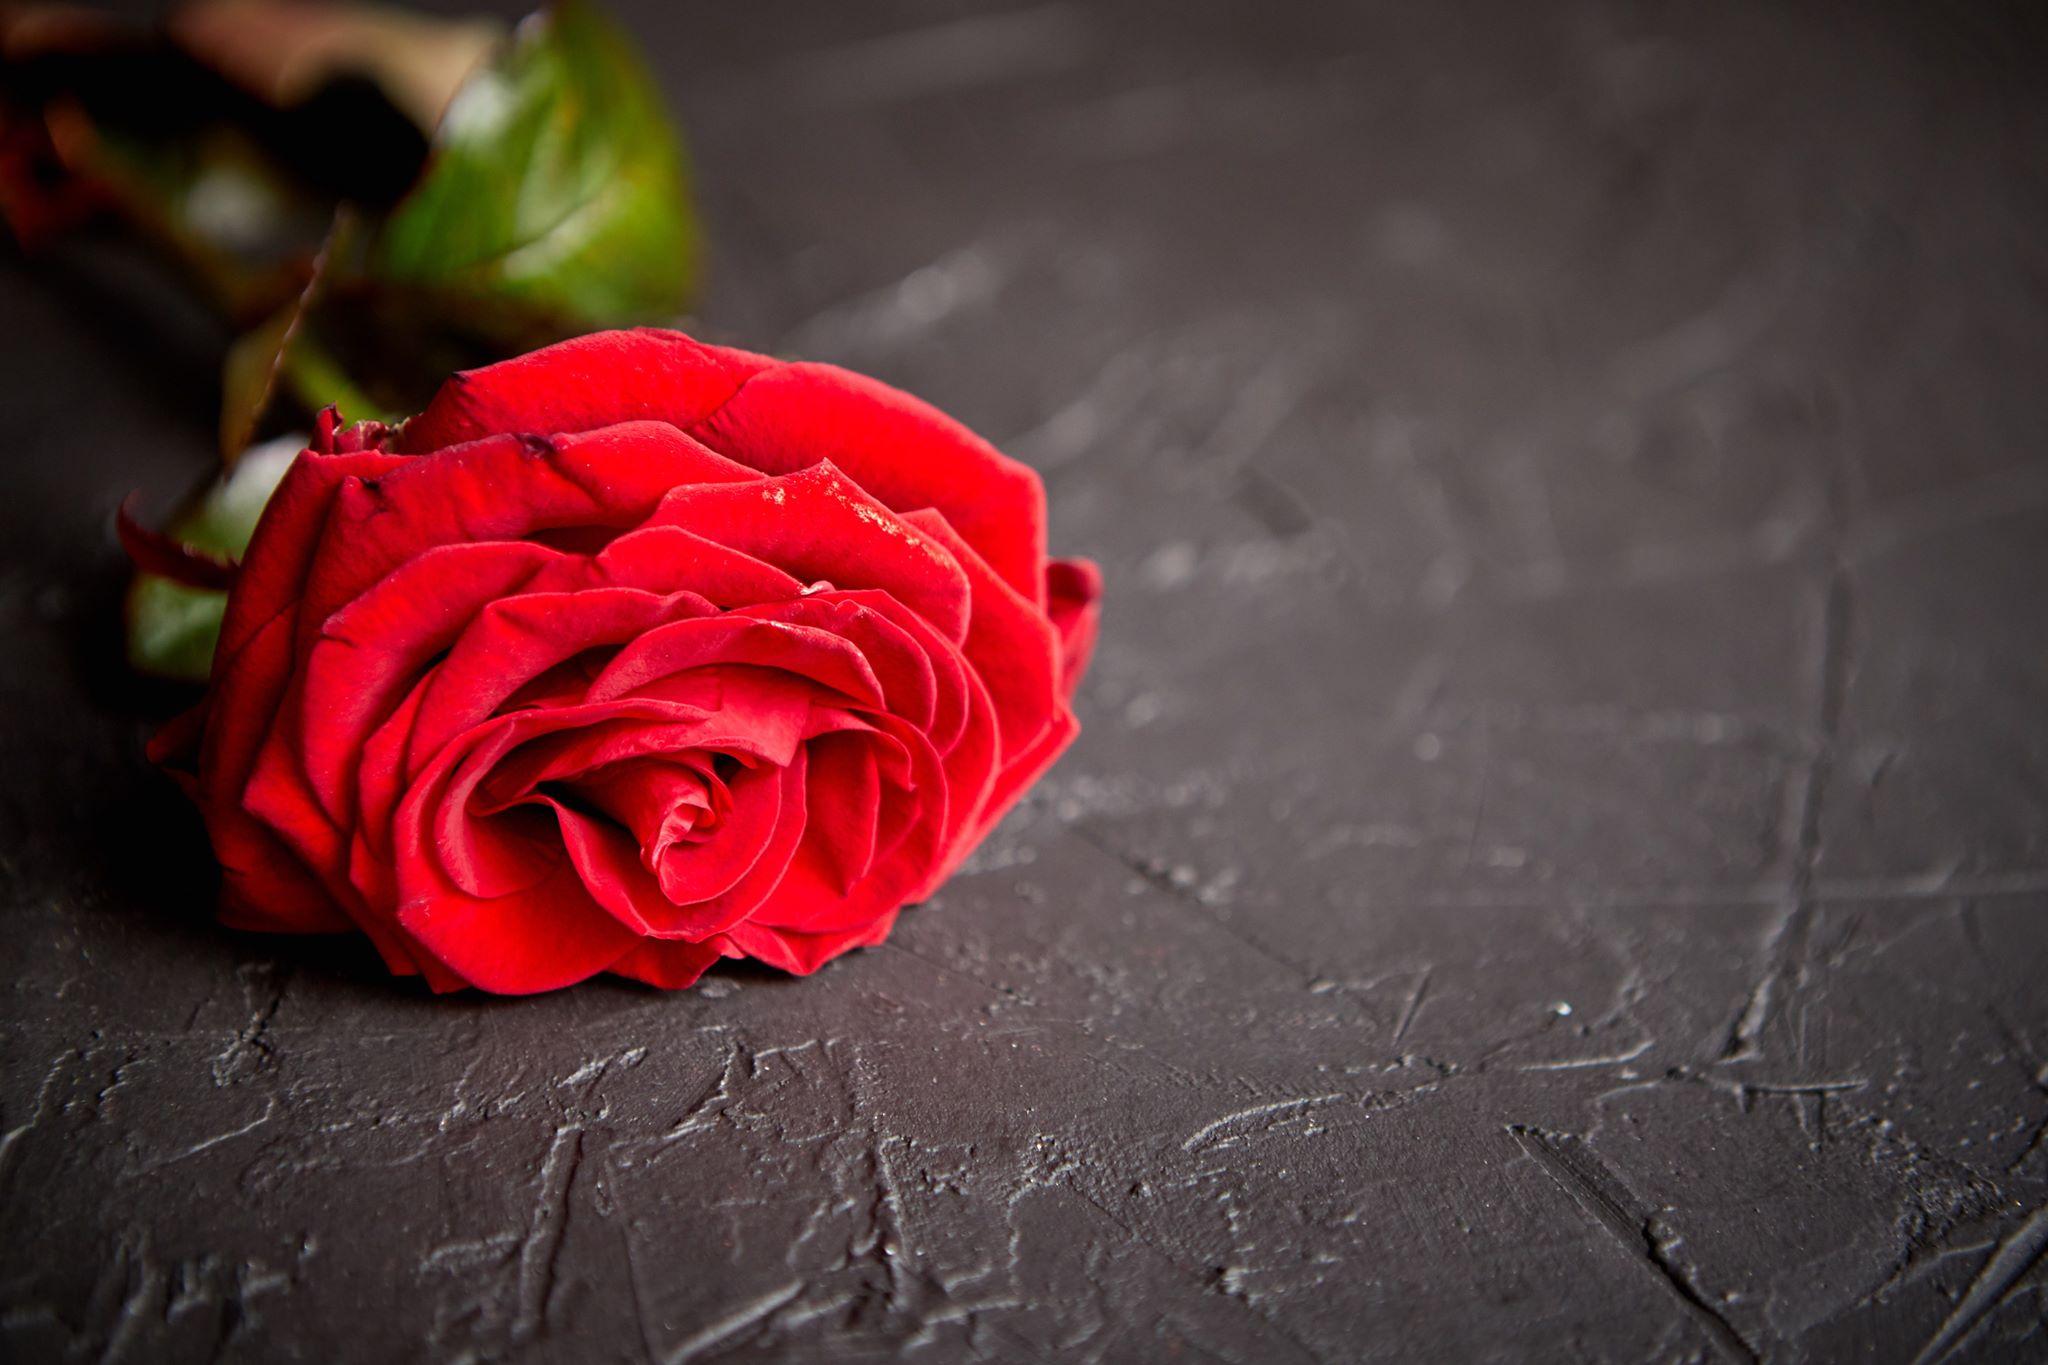 Valentines day images 23 صور عيد الحب